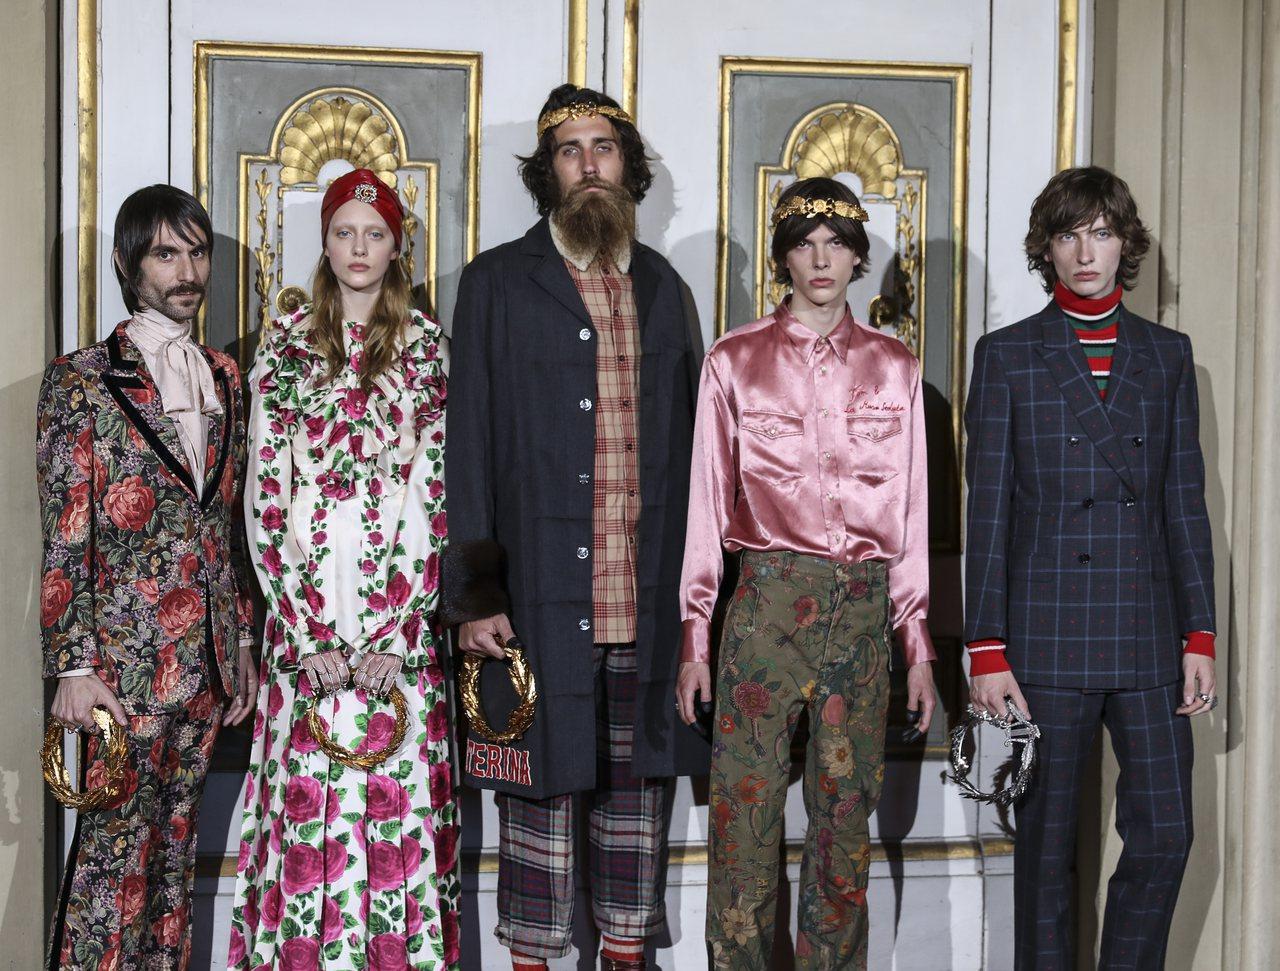 Gucci 2018早春系列,將源自於文藝復興時期的古老美學透過創意總監Alessandro Michele視角重現專屬現代化穿搭的全新風格。